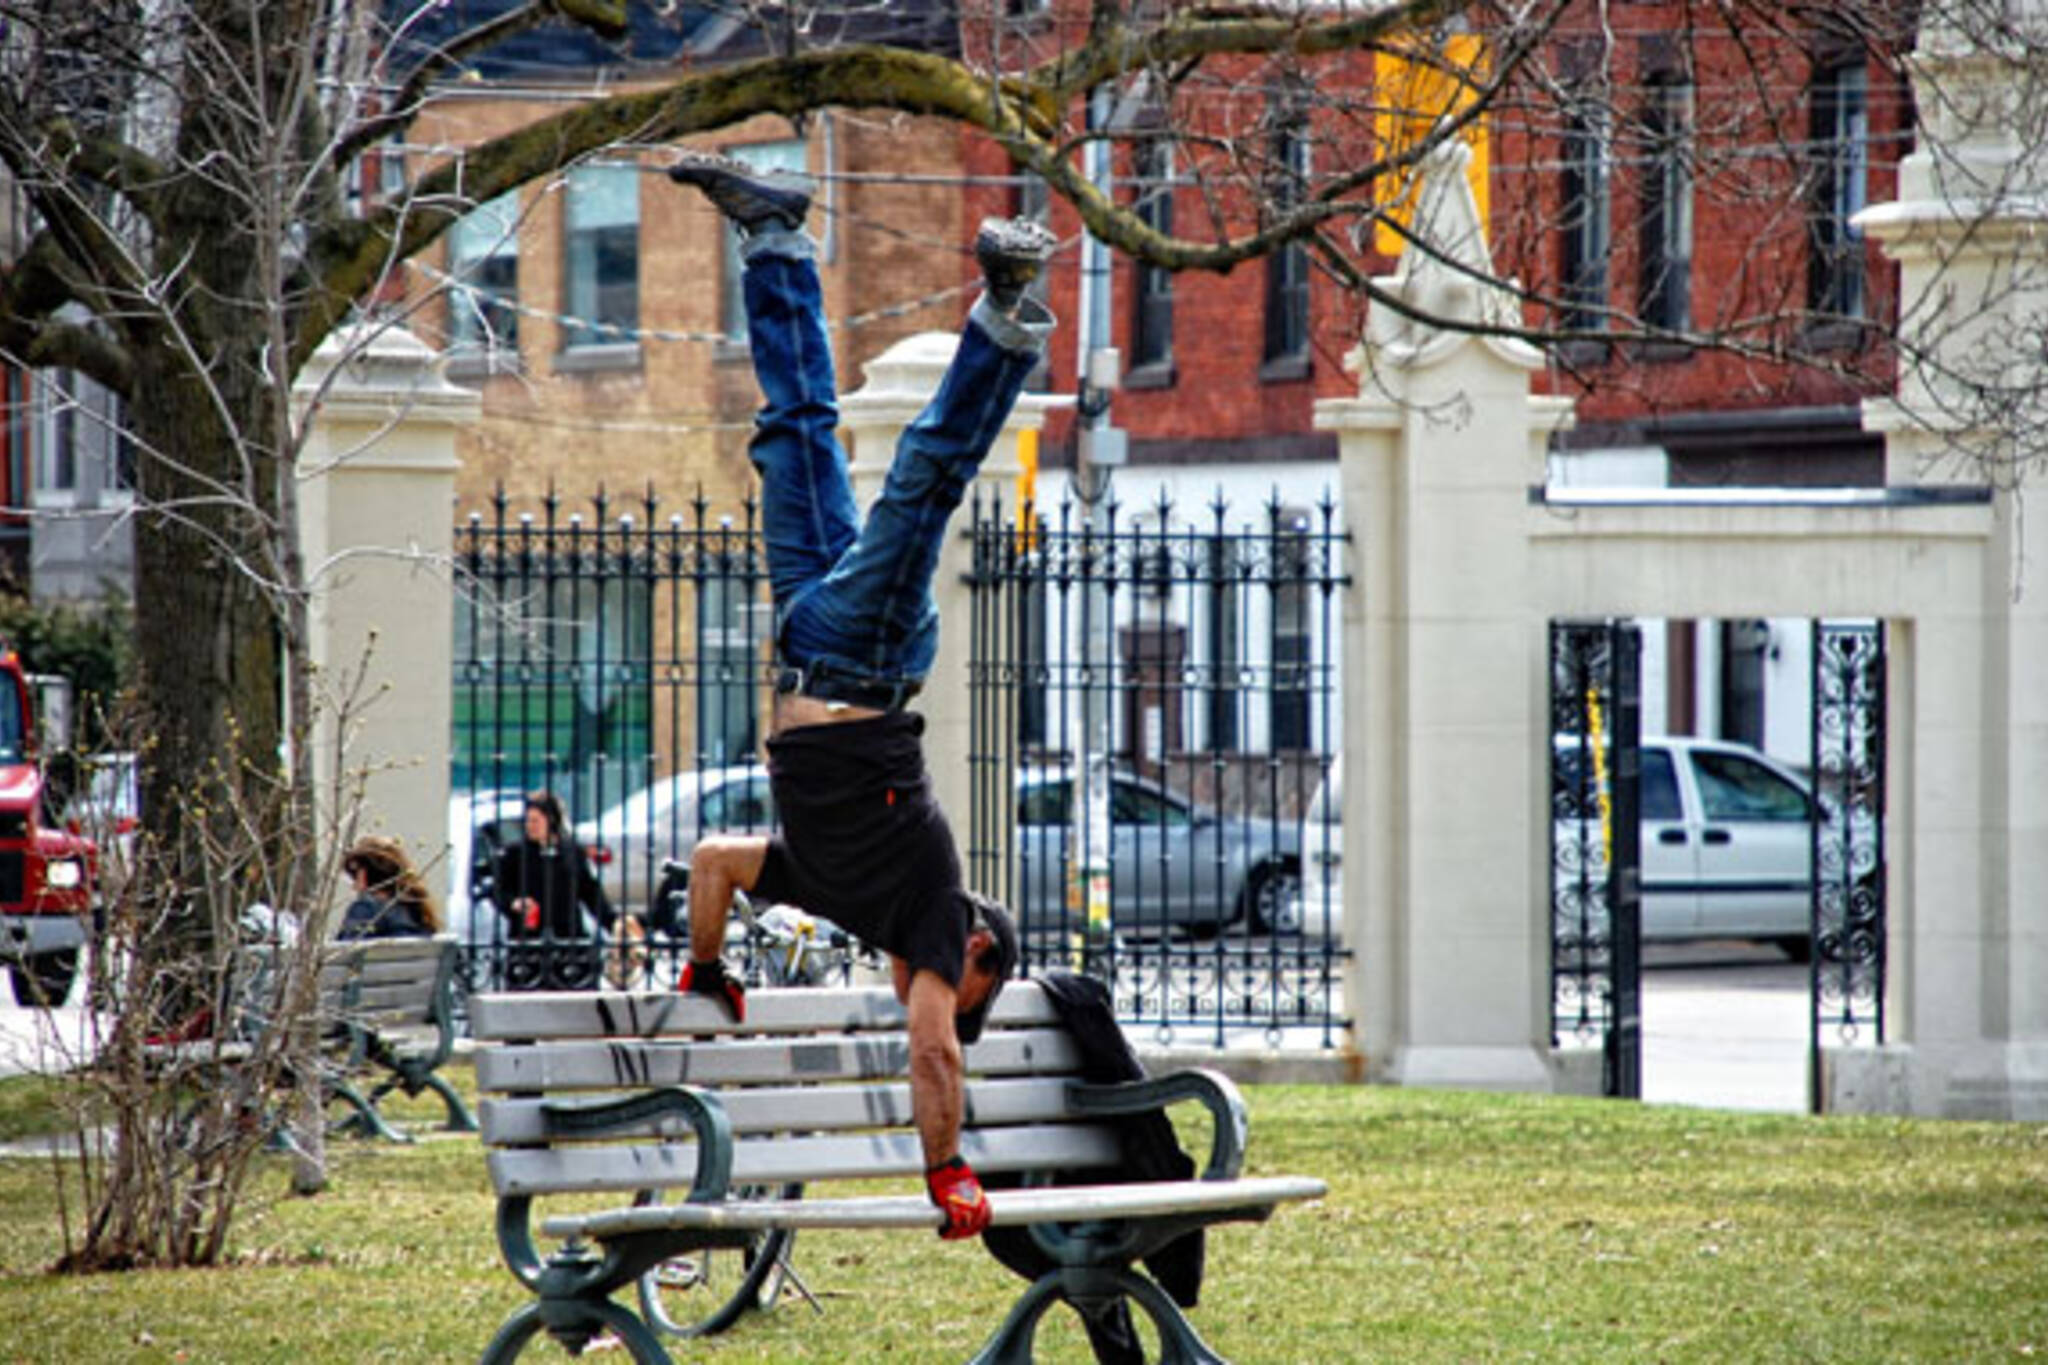 park bench acrobactics